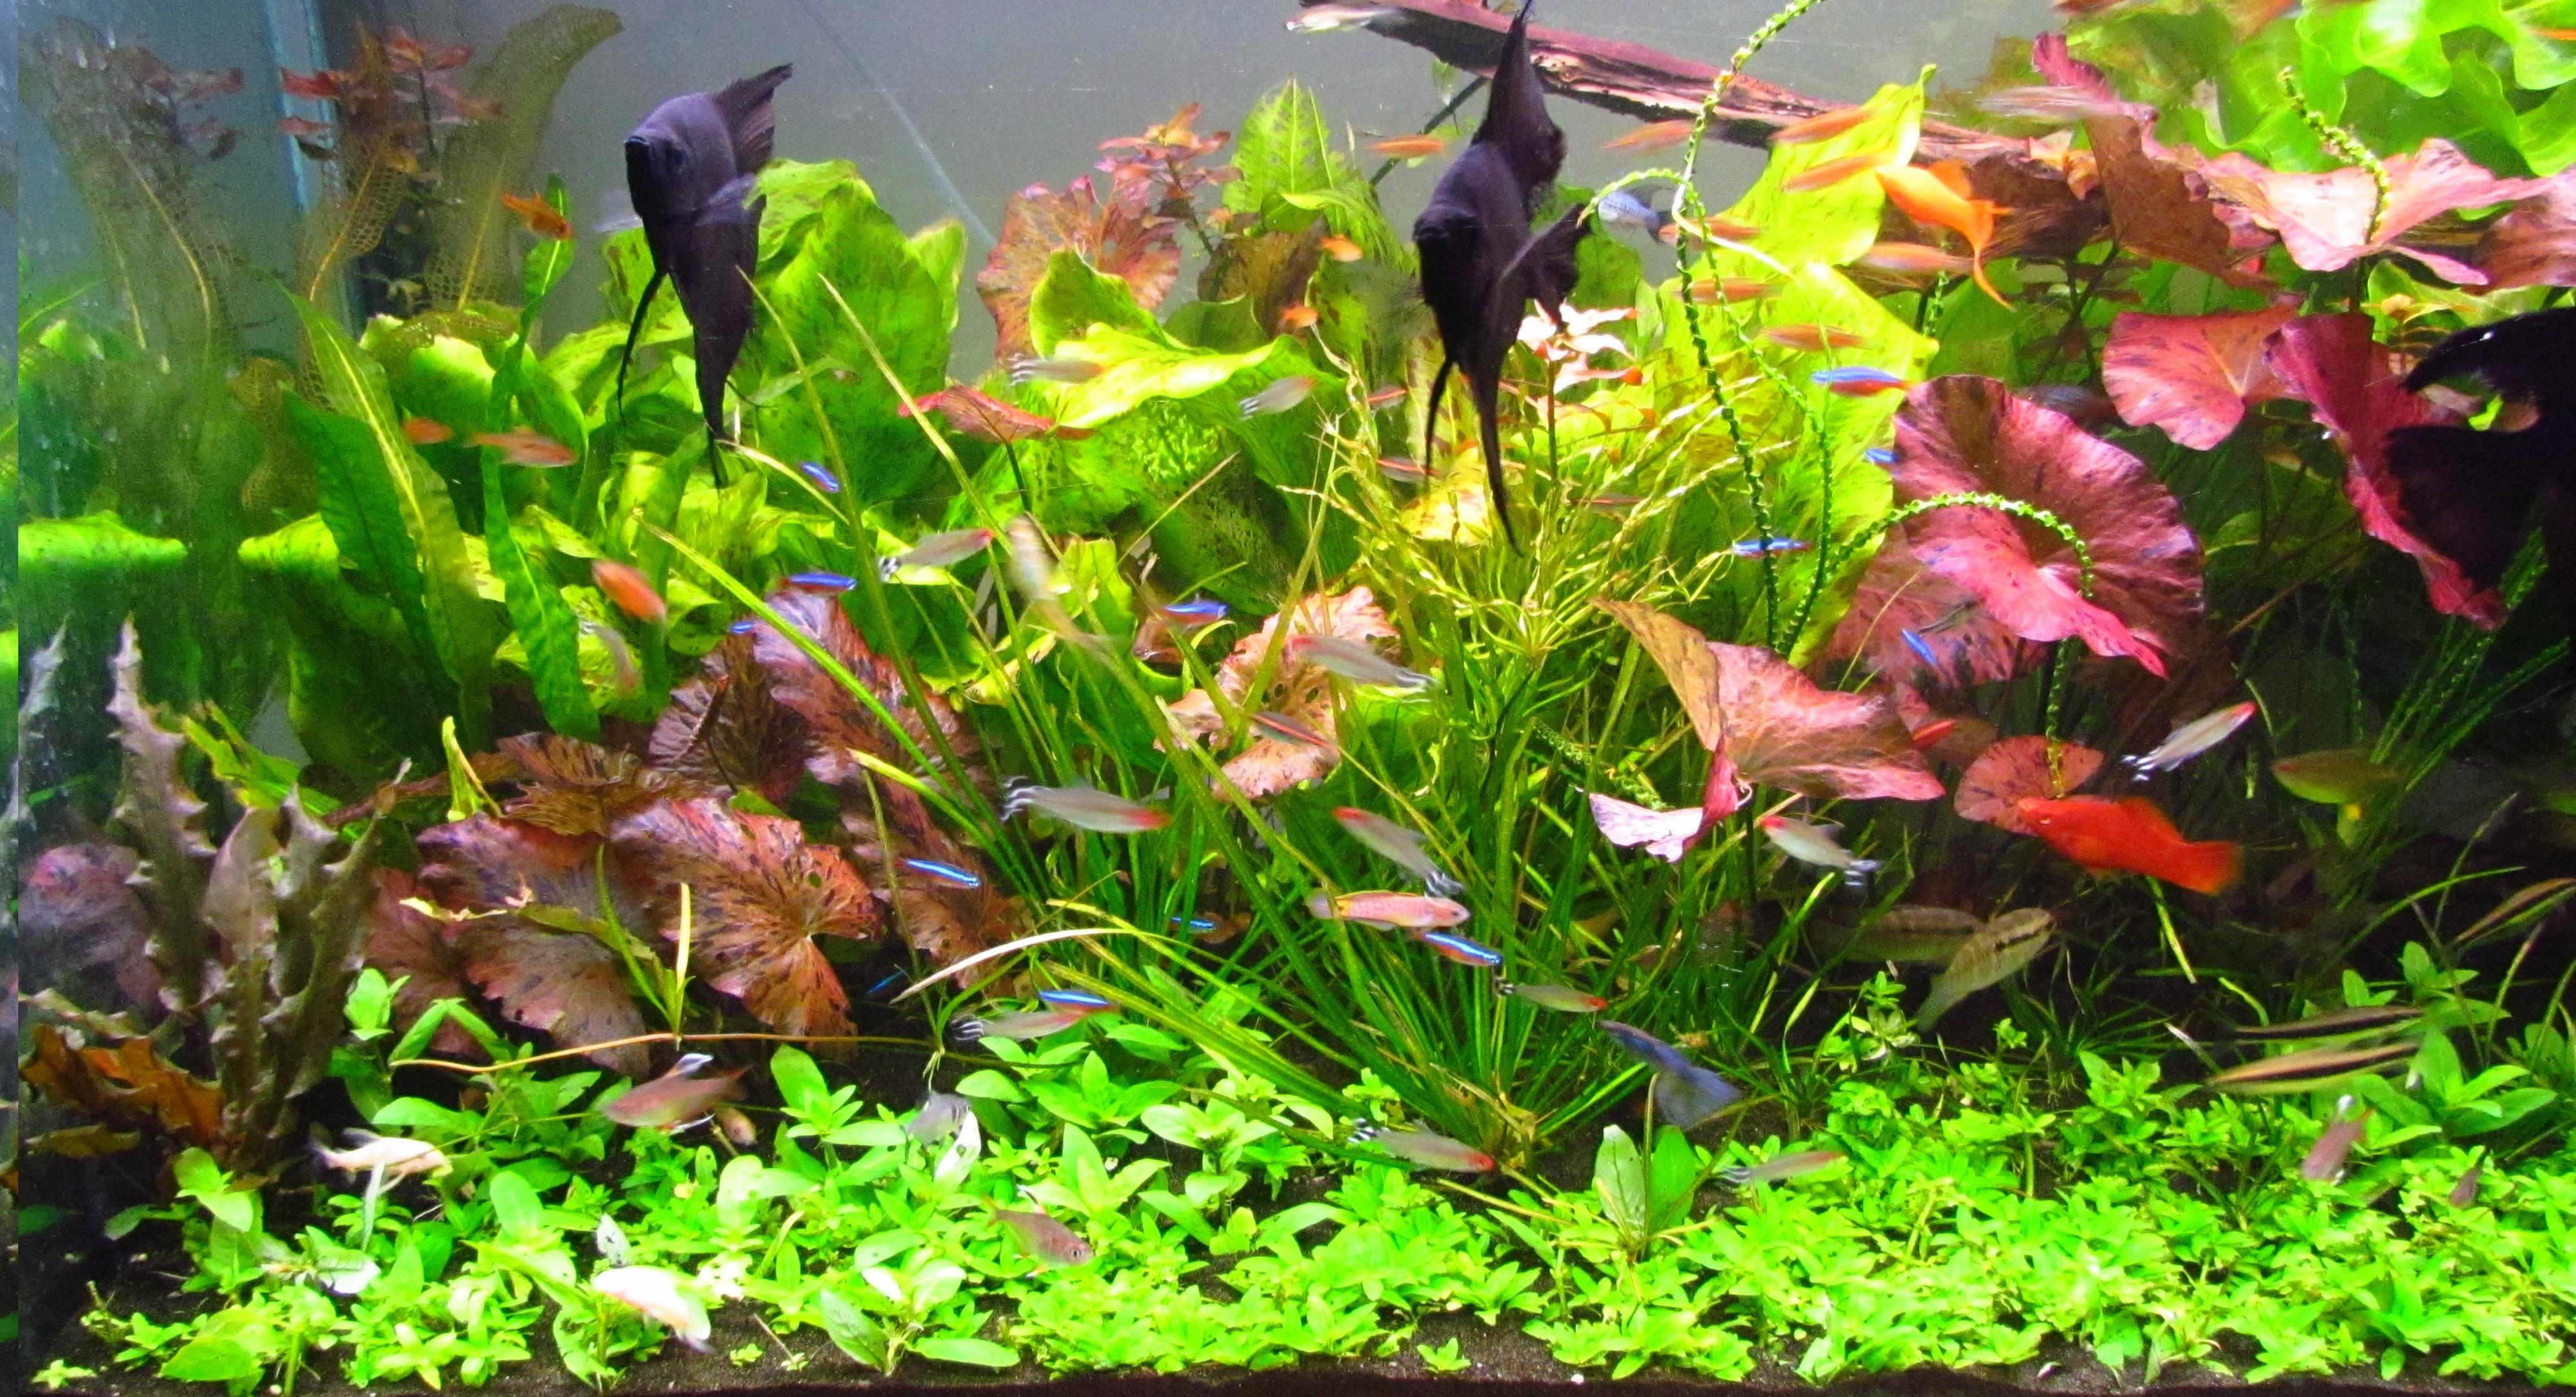 live freshwater aquarium plants for sale cheap low prices moss